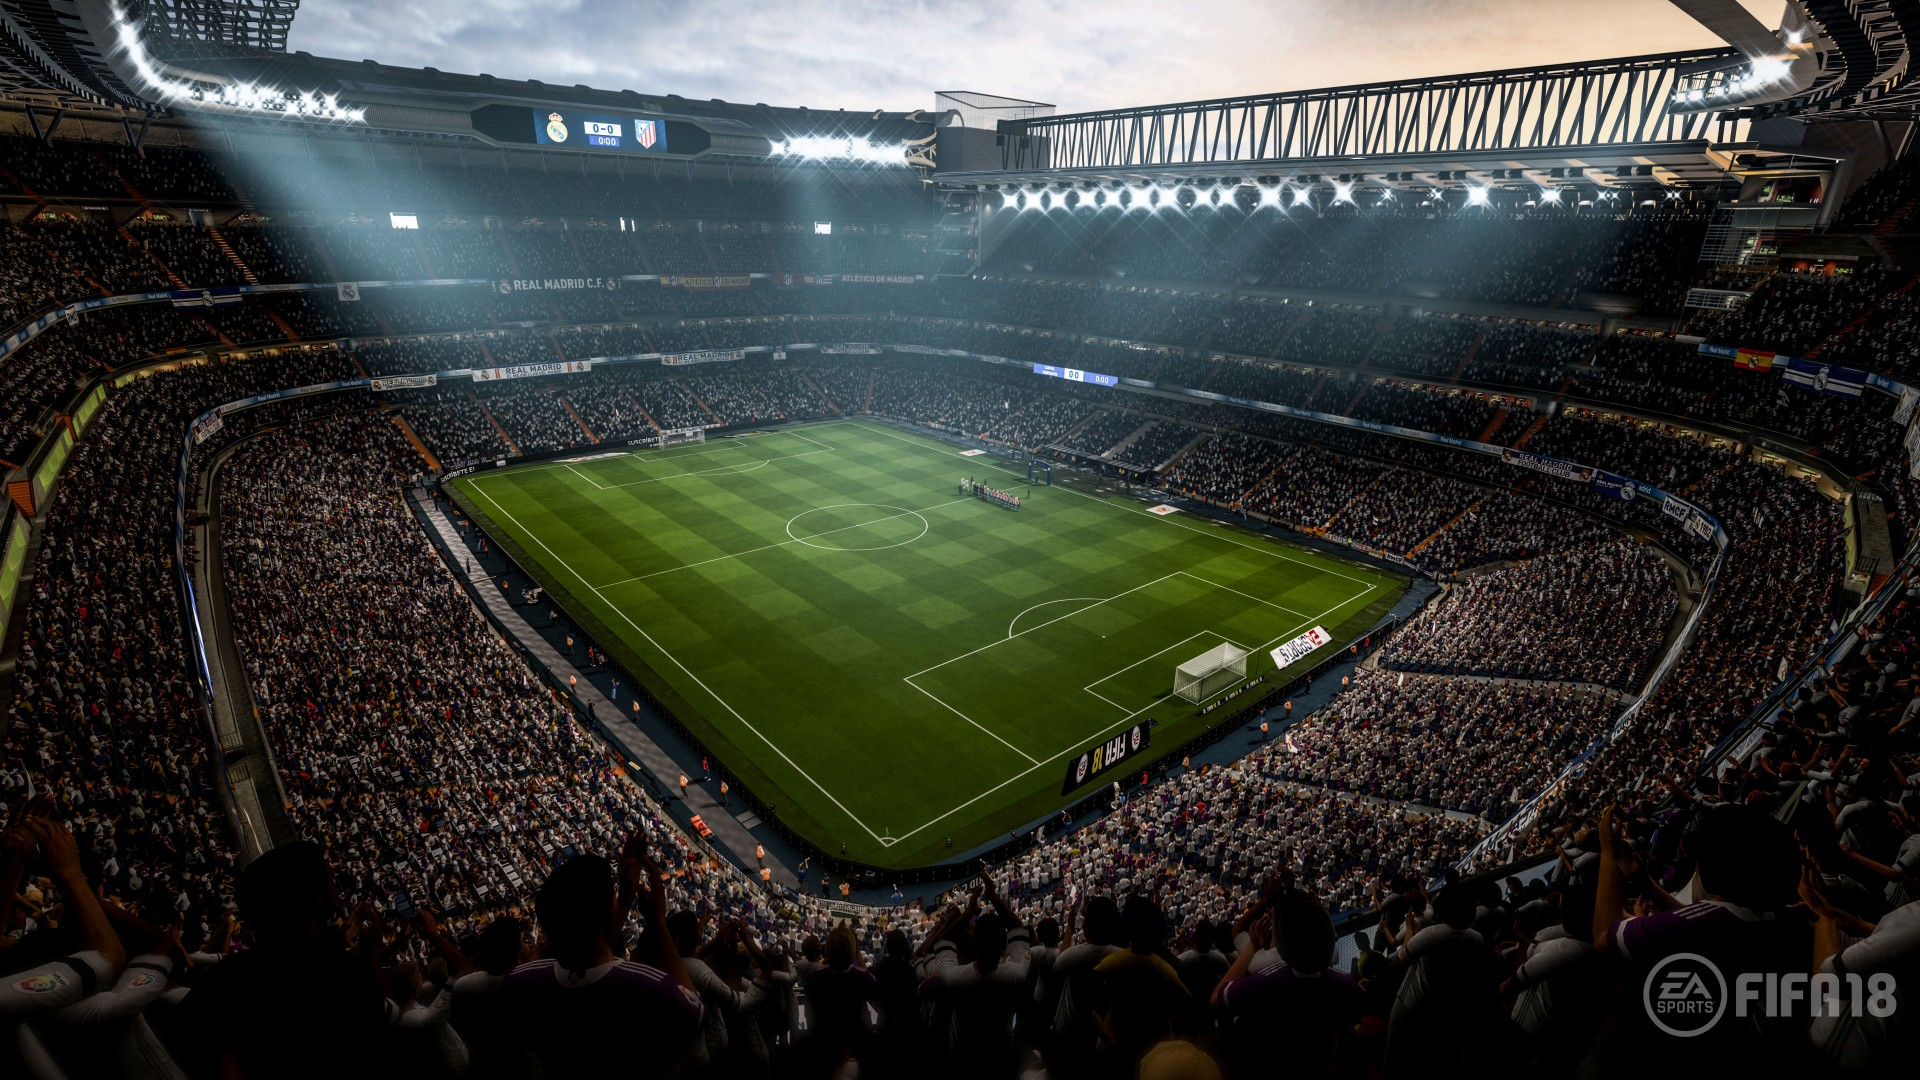 FIFA 18 Stadium Wallpaper